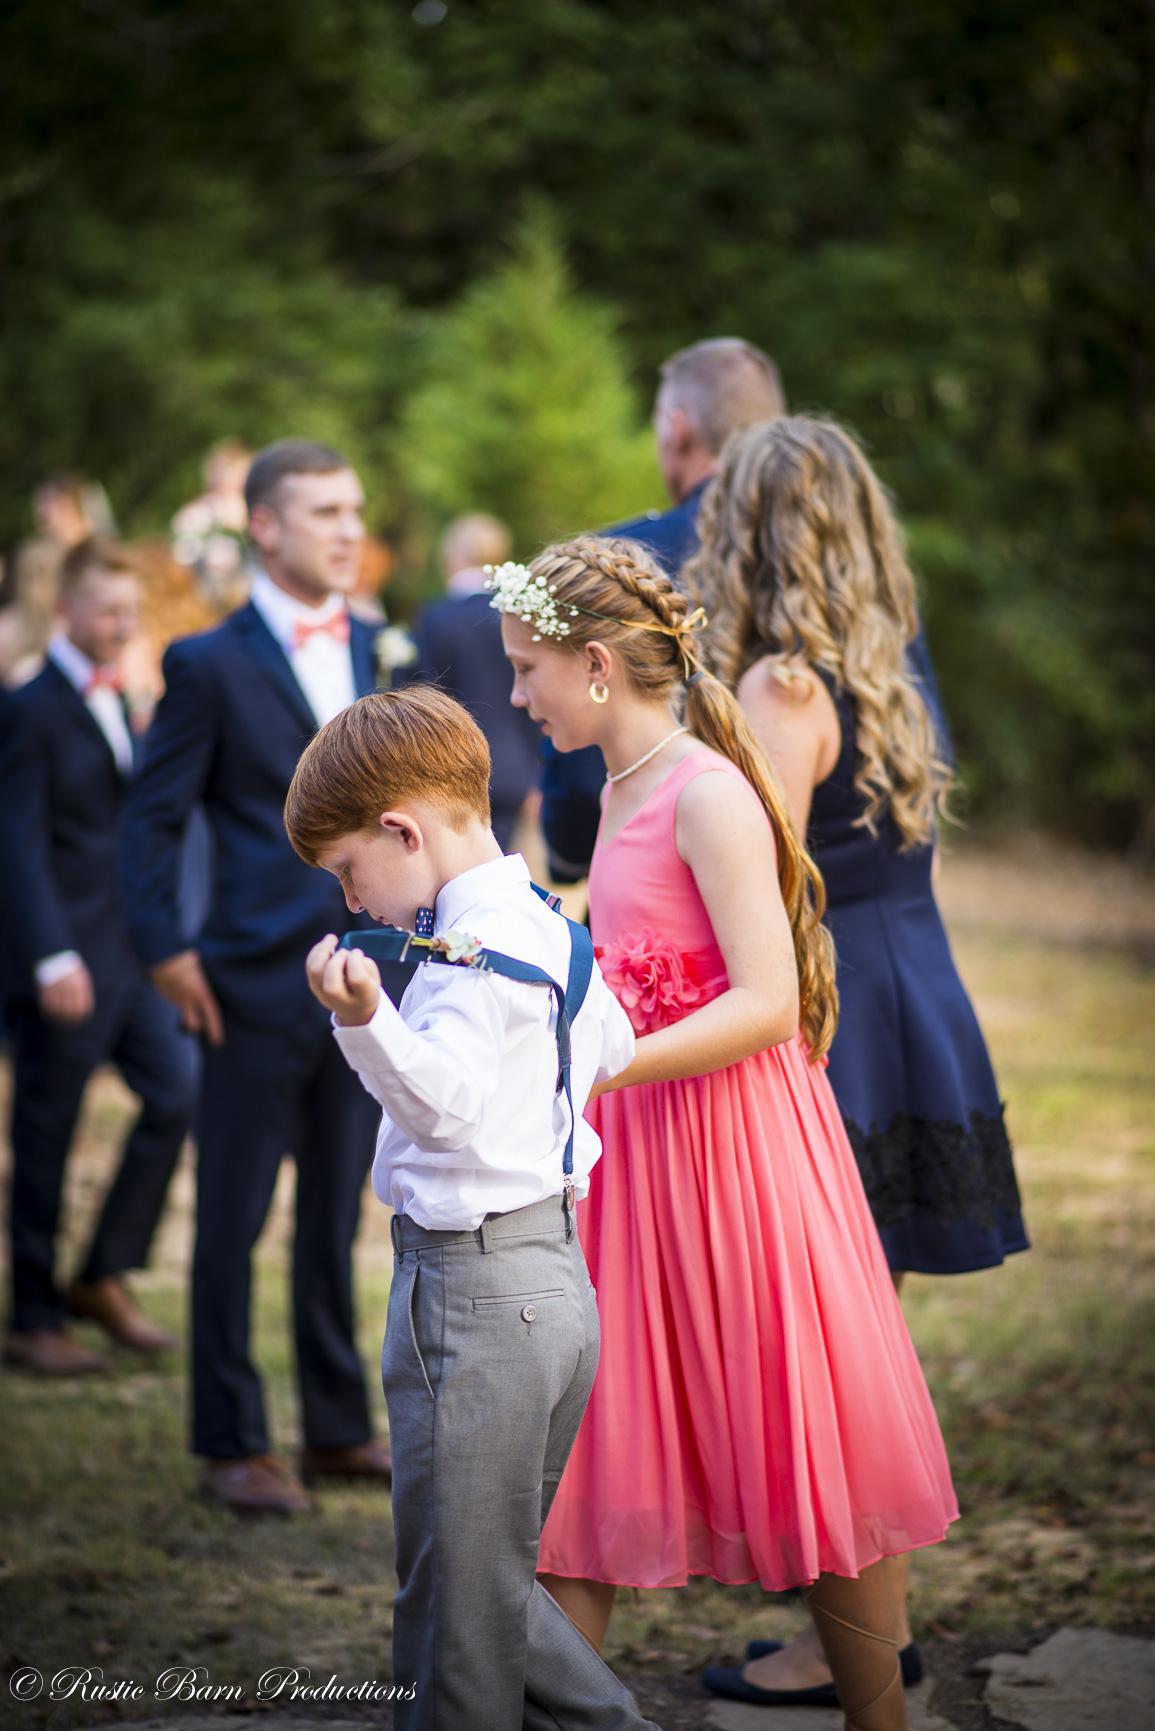 Shelby and Nates wedding-9401.jpg